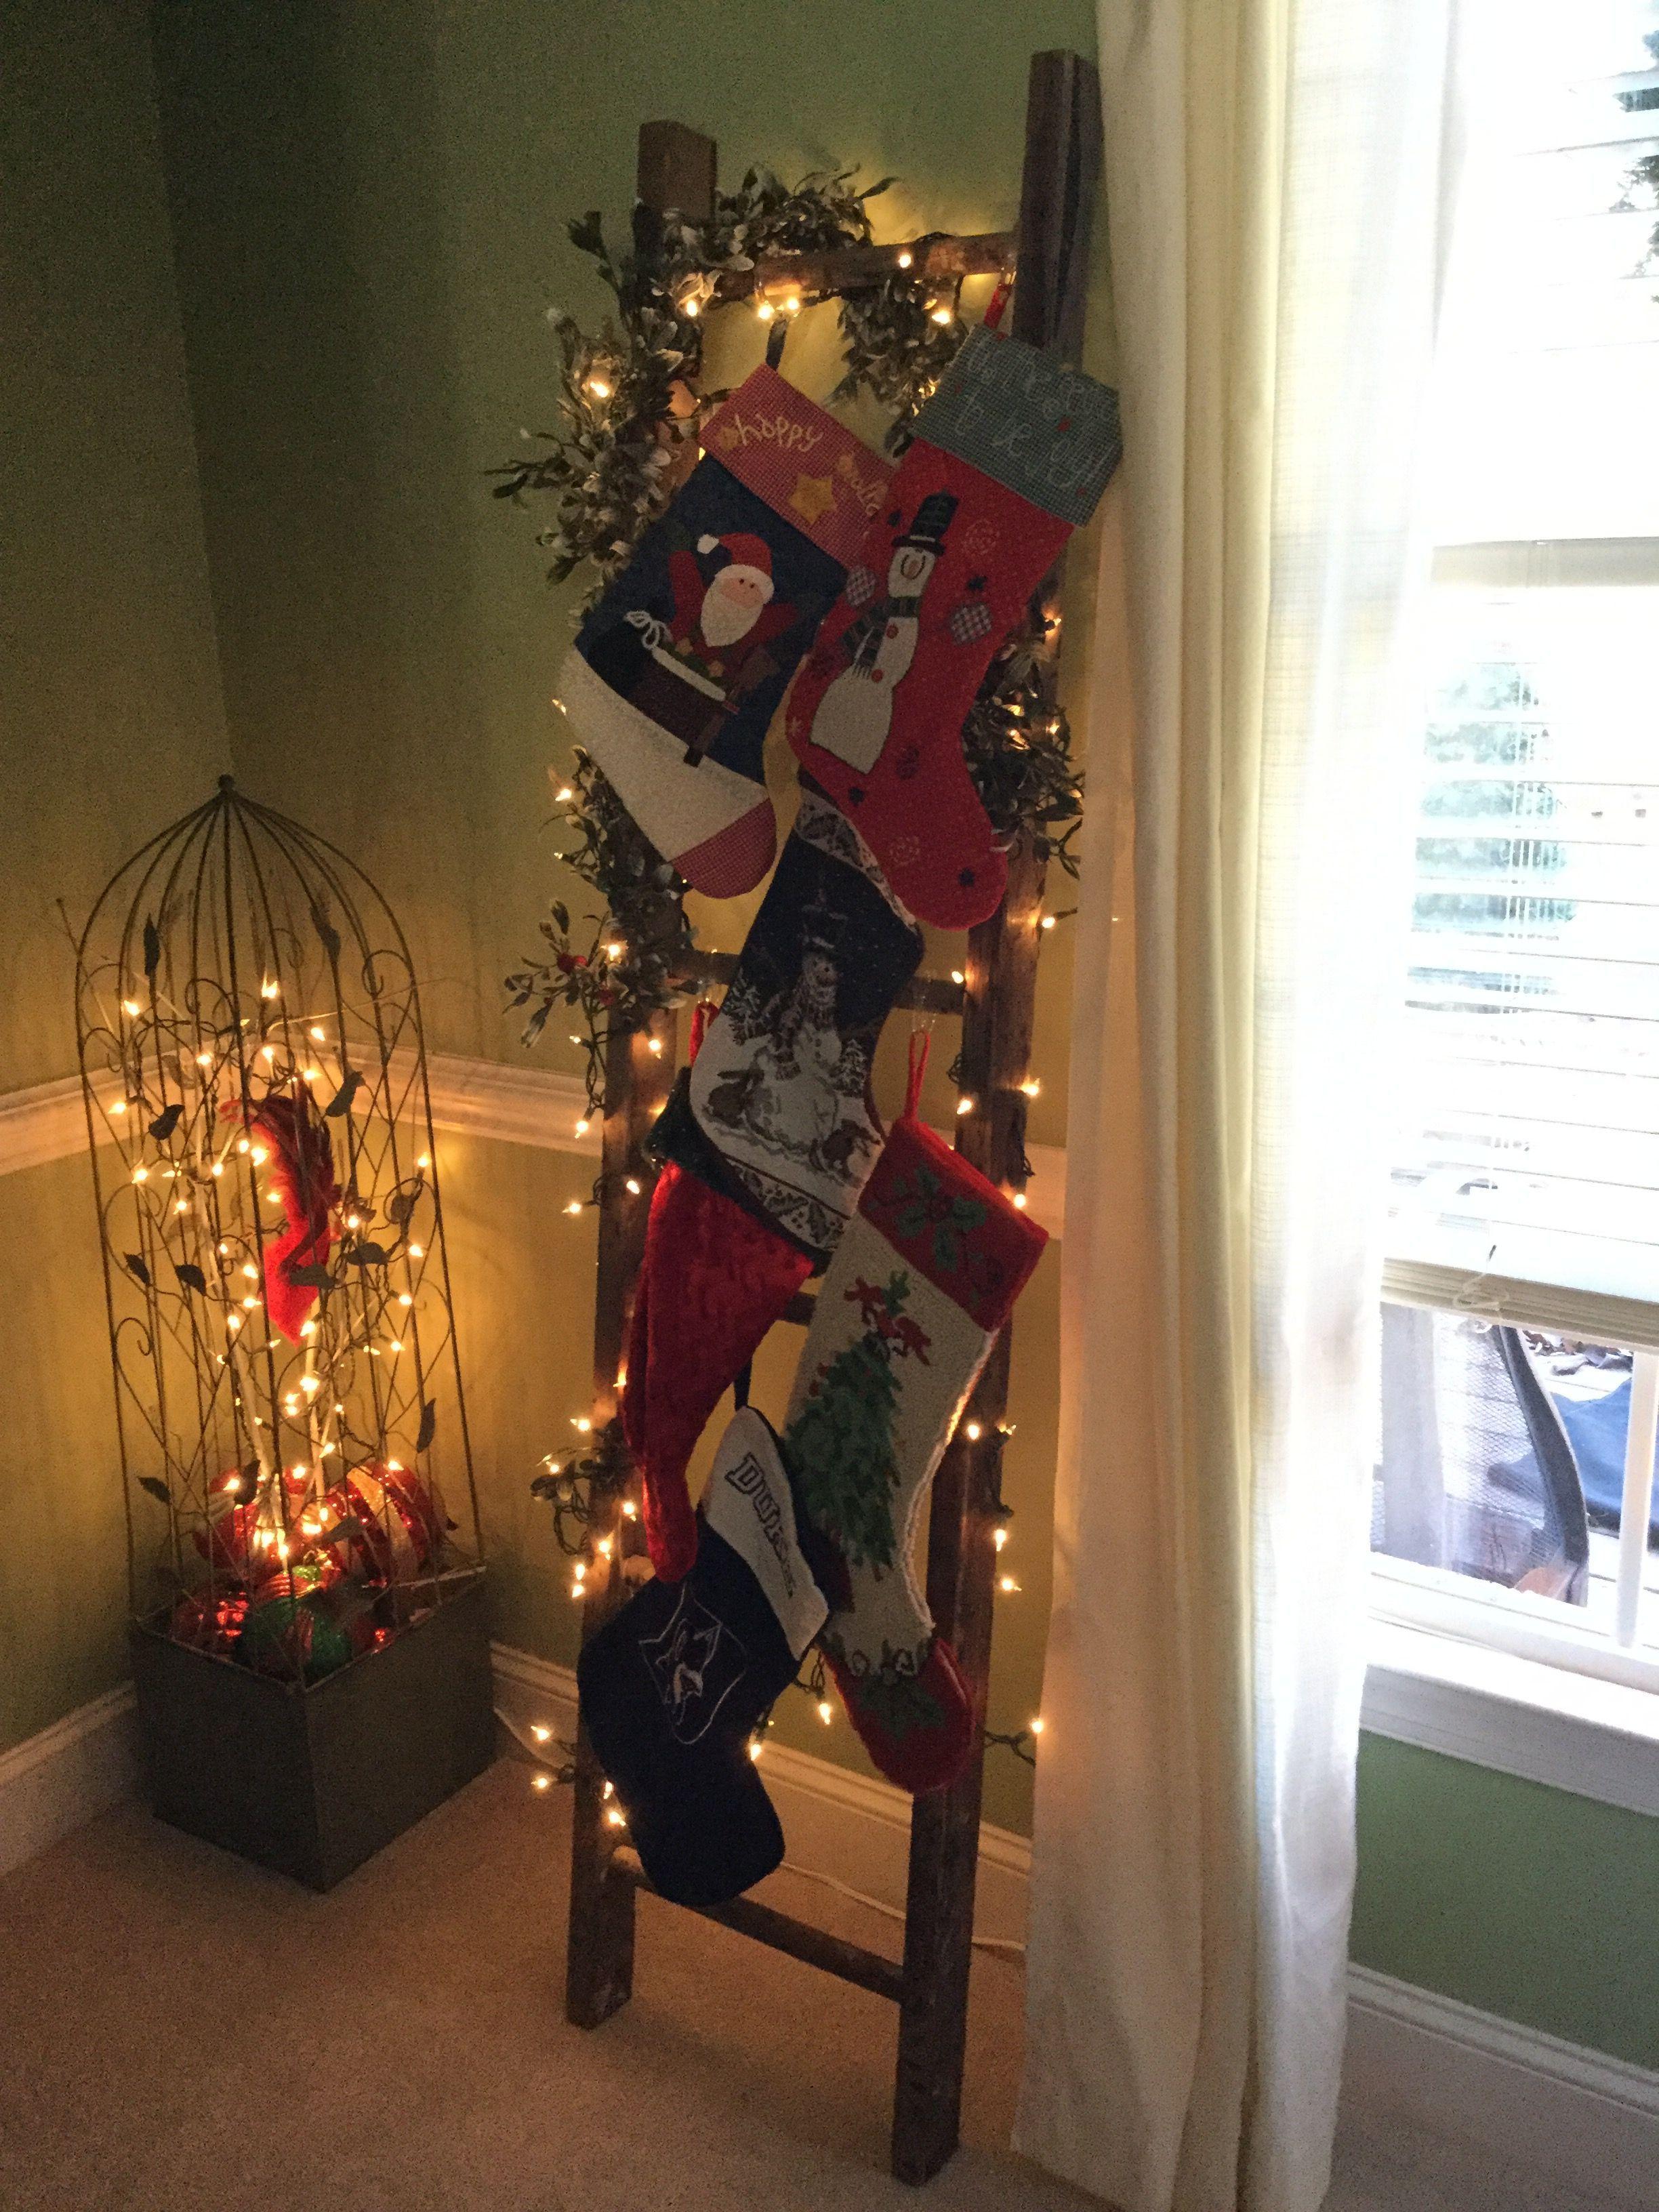 Antique ladder stocking holder Christmas decor diy